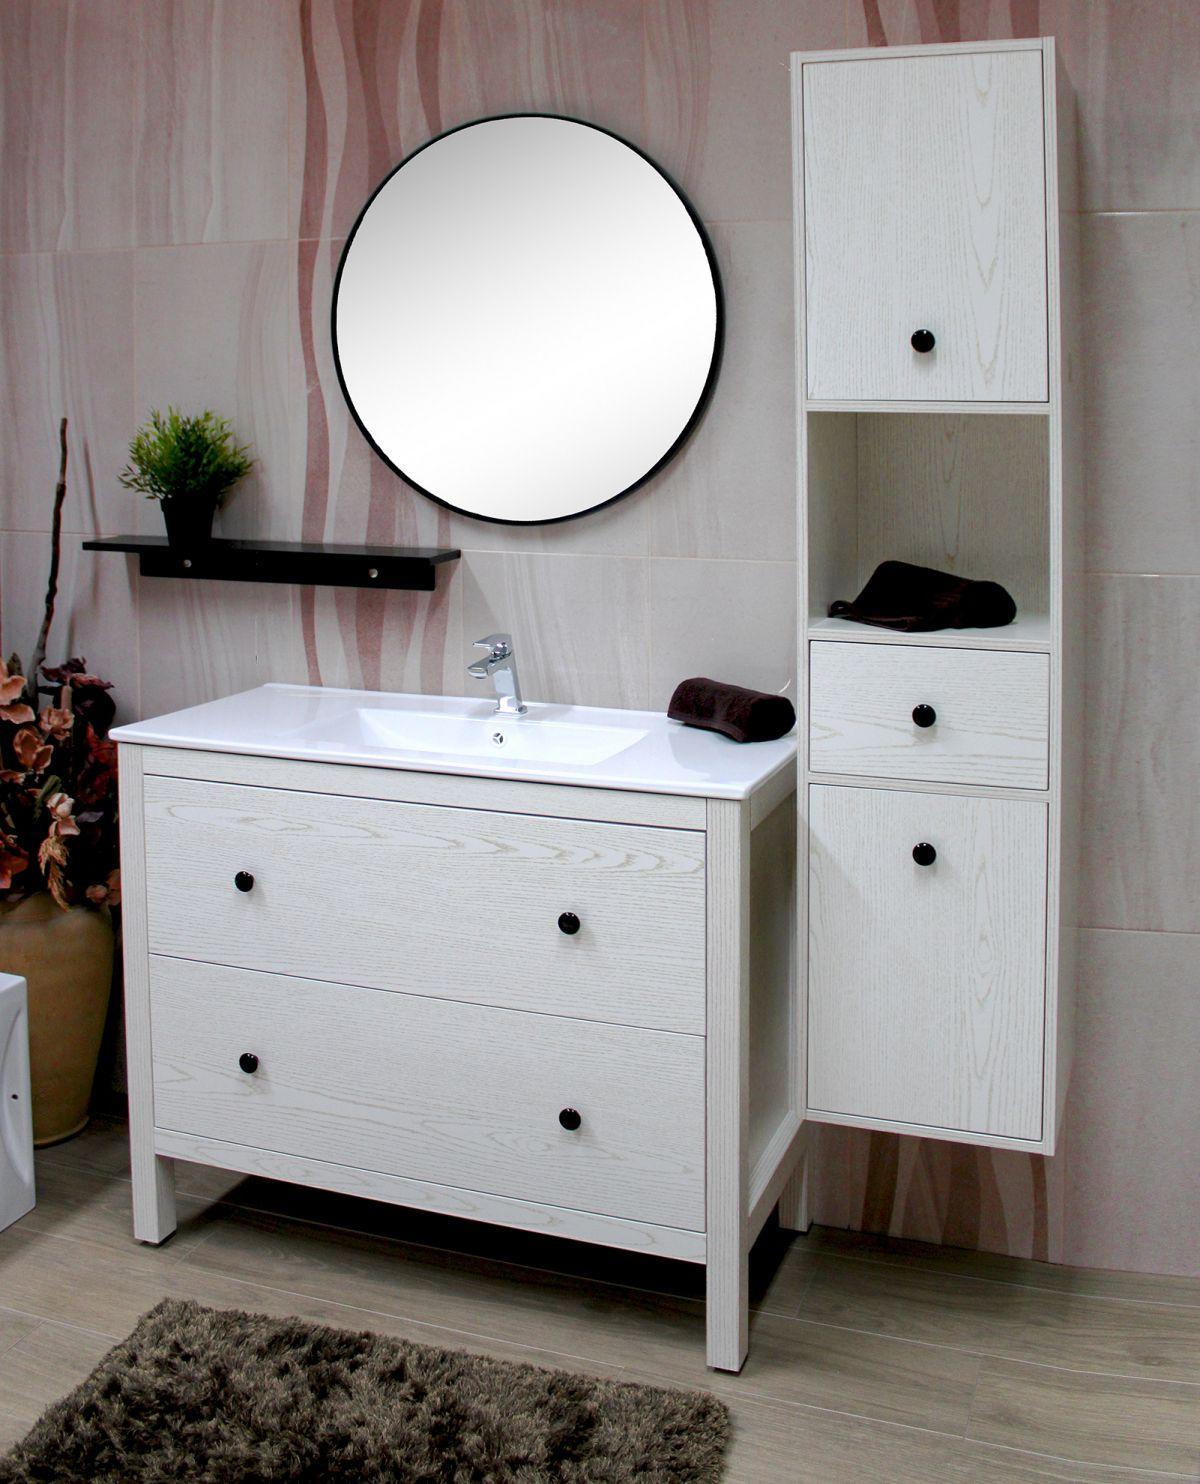 PARIGI BIANCO 3 Mobile bagno Parigi terra 100 cm bianco decapè con lavabo specchio, pensile e colonna